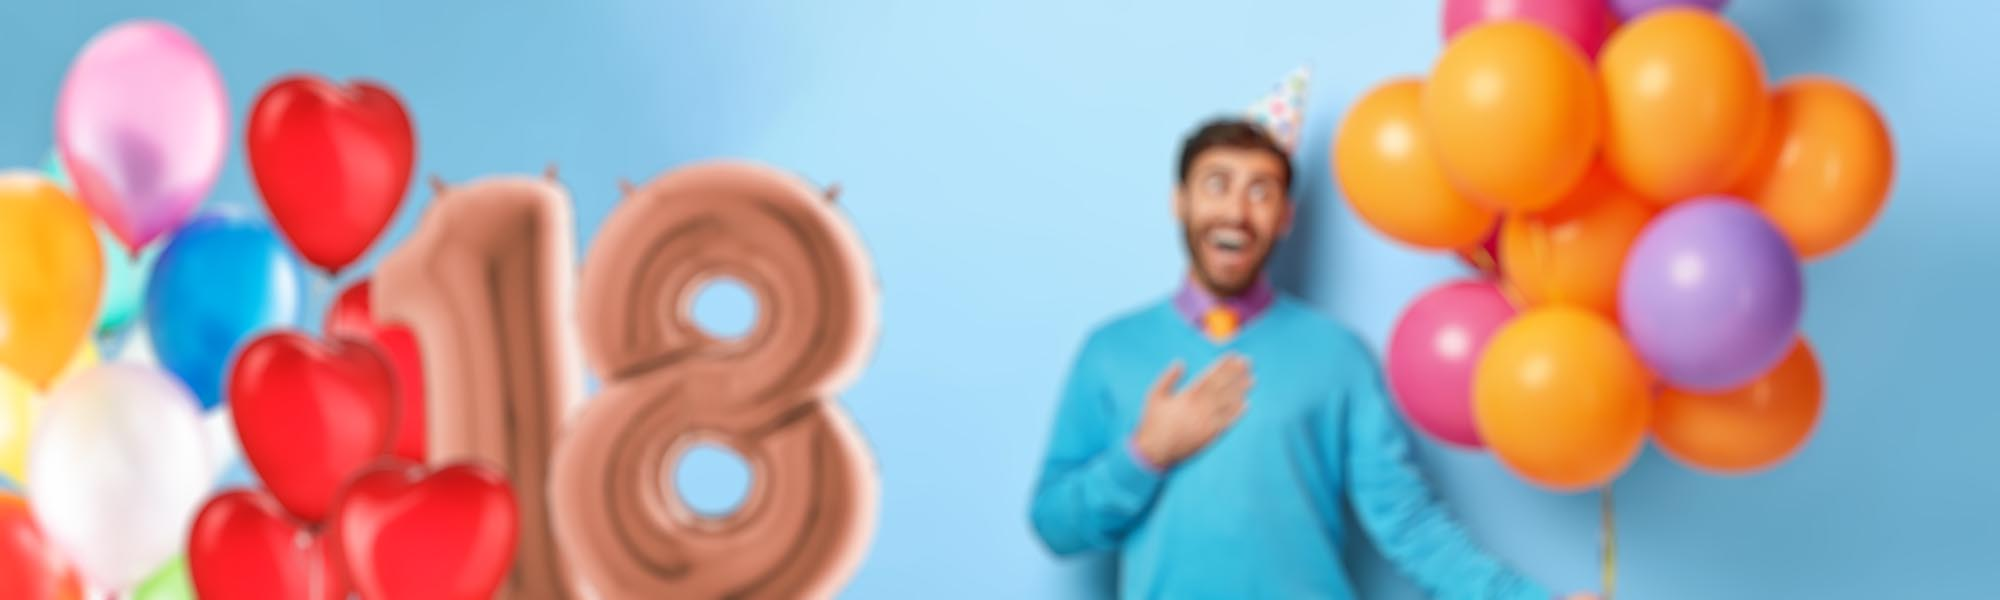 Feiermeier De Ballons Partydeko Kostüme Günstig Online Kaufen